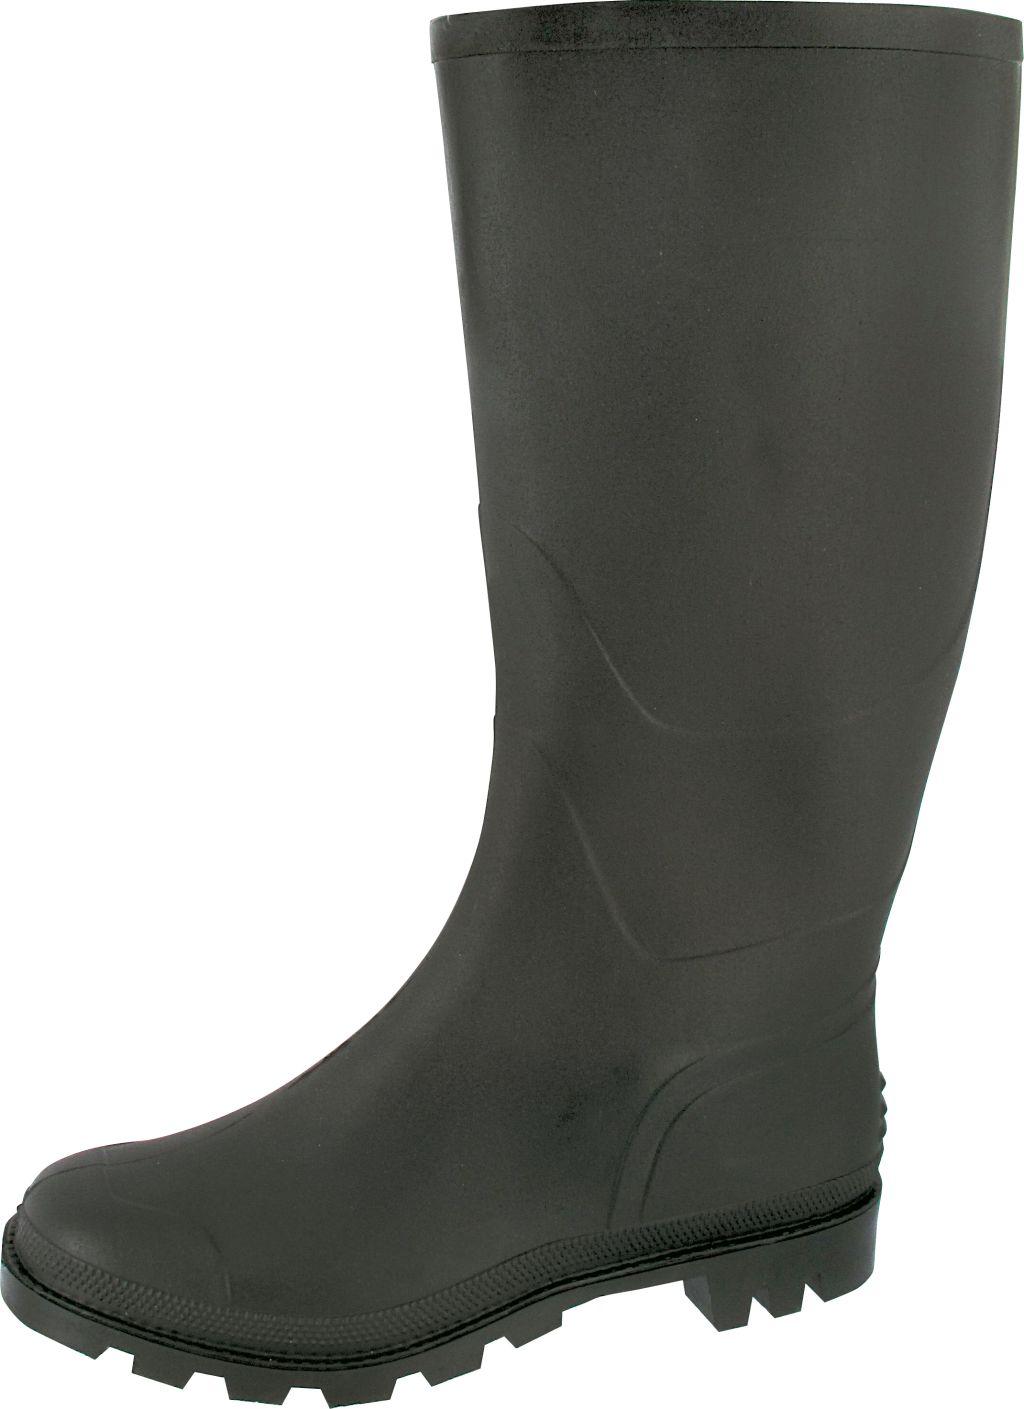 Triuso PVC Stiefel Paul schwarz 45   Schuhe   Bekleidung